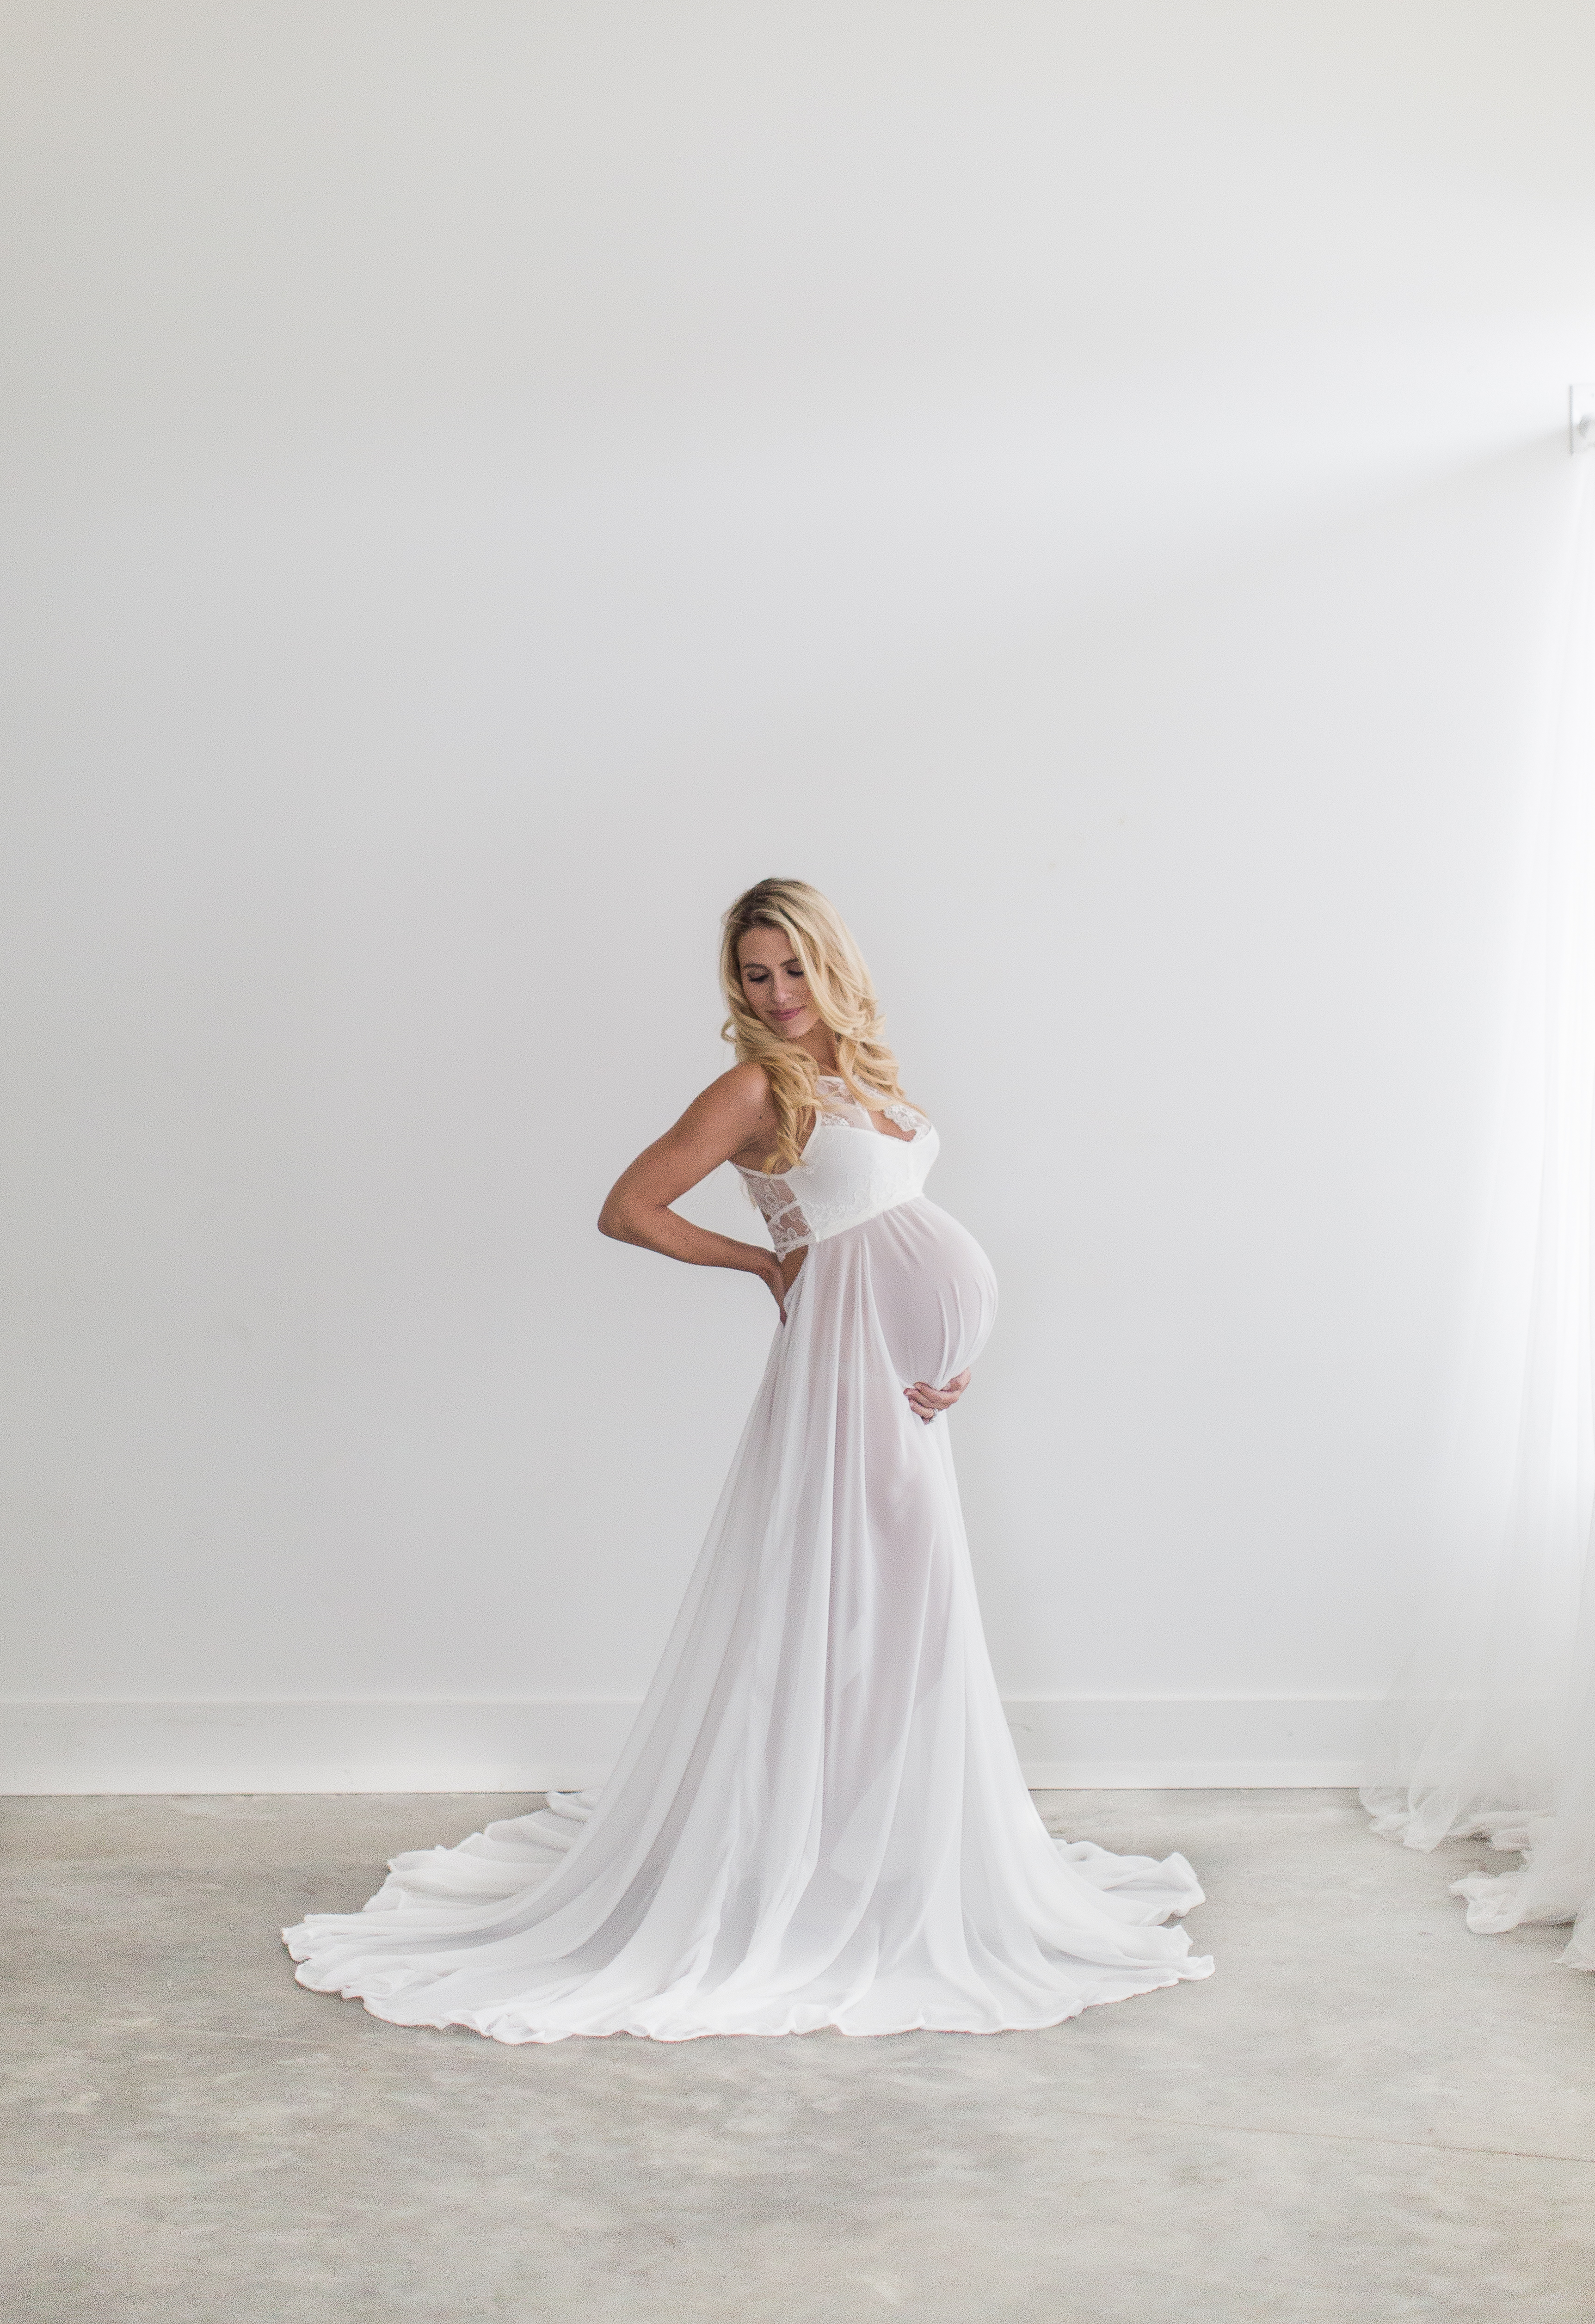 seattle maternity photographer, seattle newborn photographer